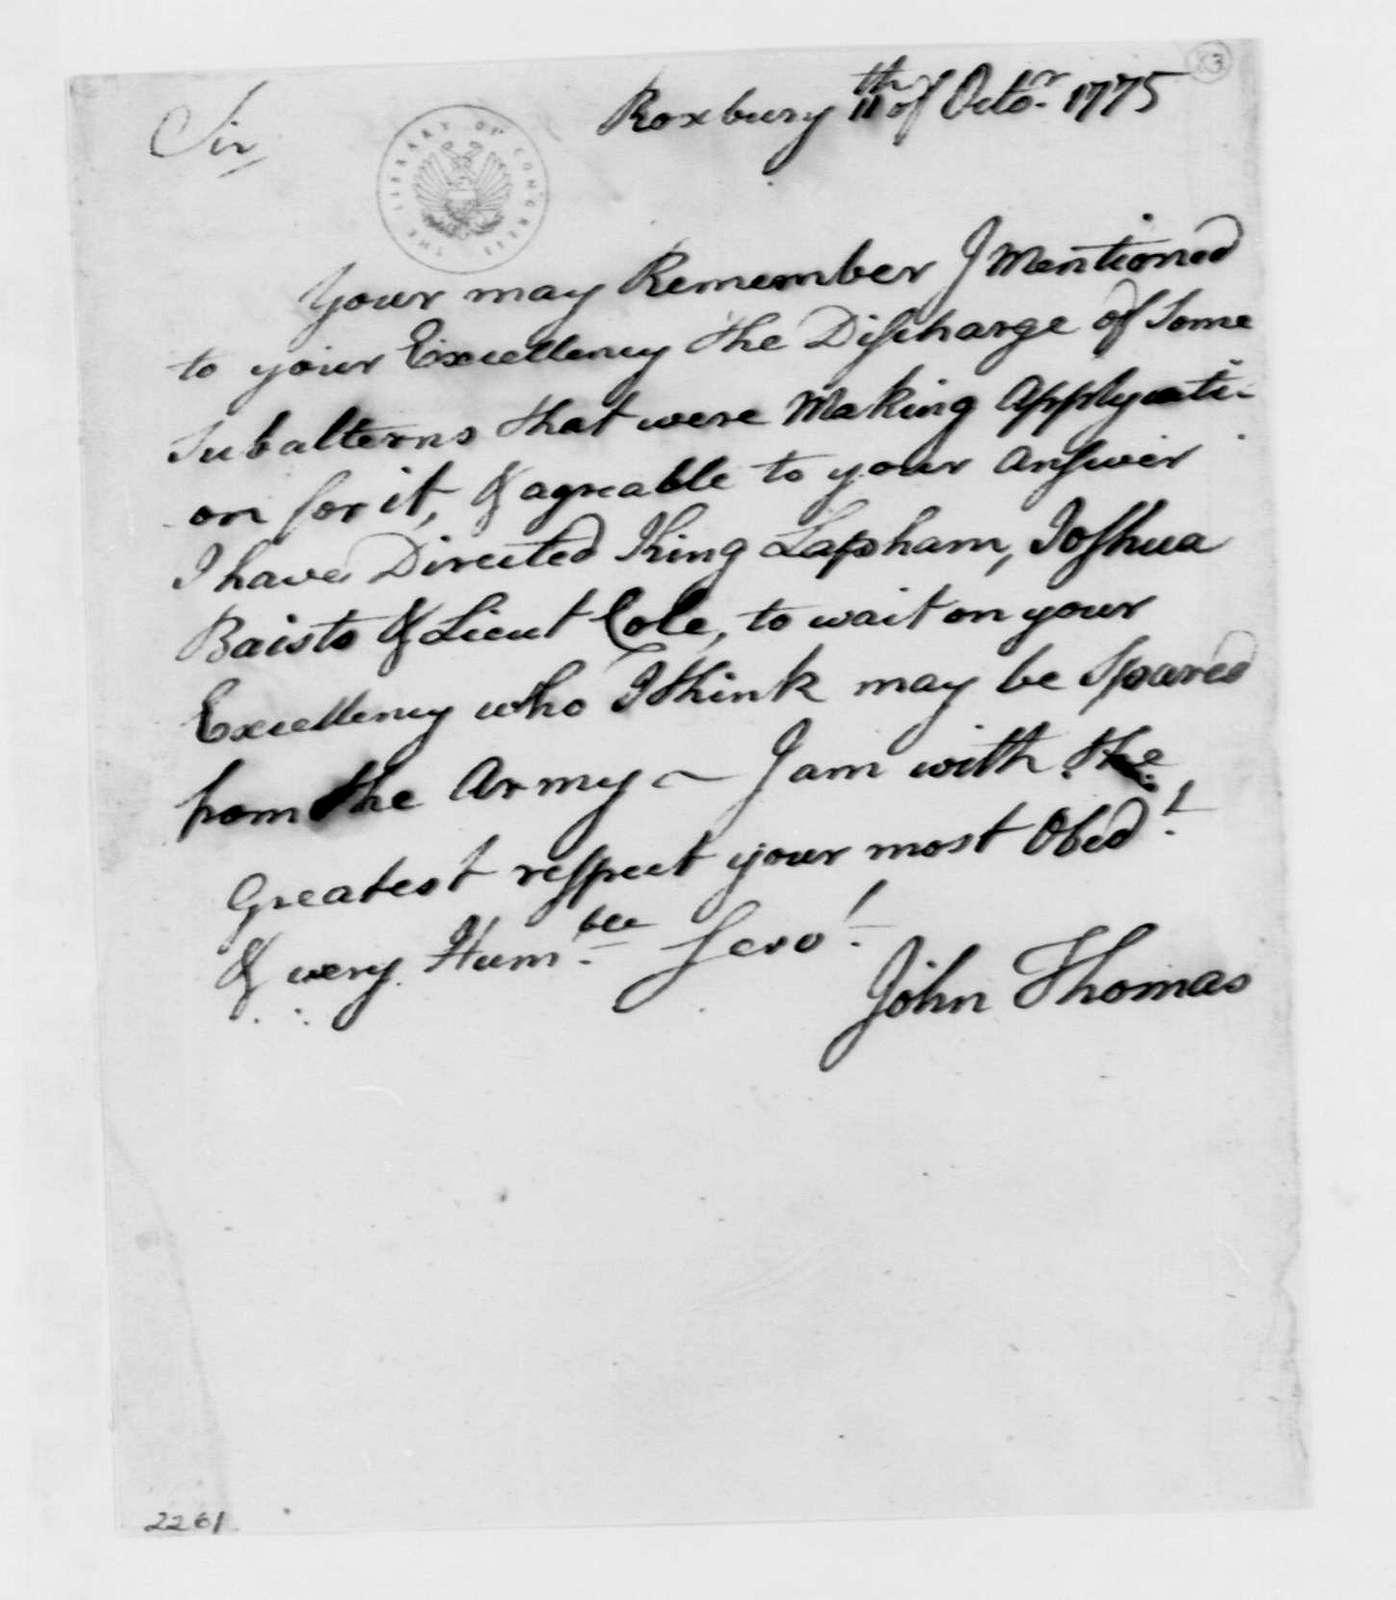 George Washington Papers, Series 4, General Correspondence: John Thomas to George Washington, October 11, 1775